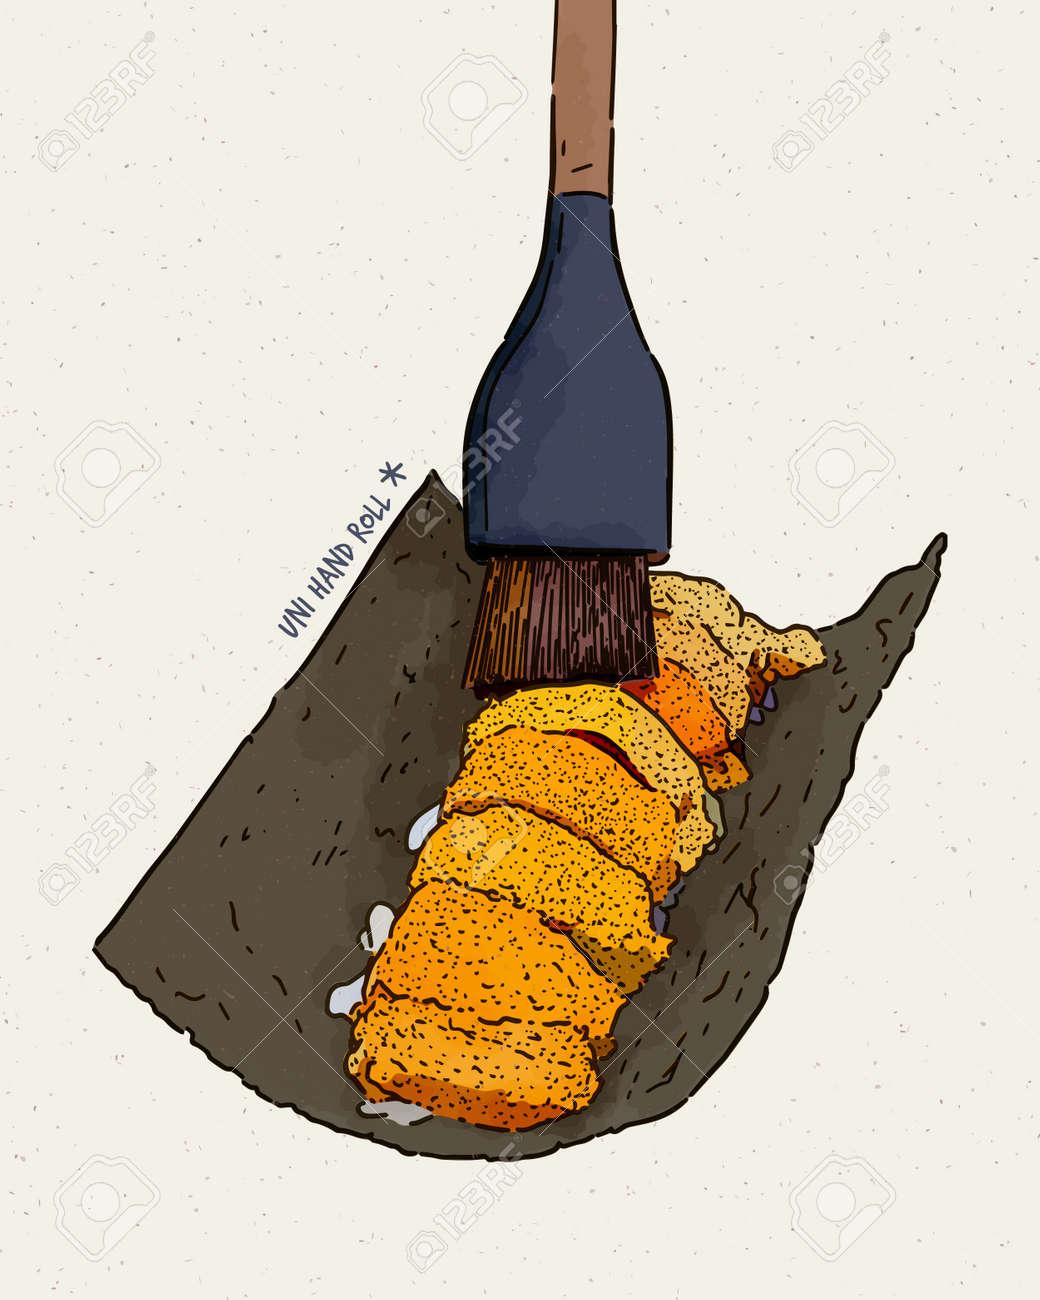 Omakase Uni - fresh sweet uni sashimi of dried seaweed, Japanese traditional food. hand draw sketch vector. - 165340375